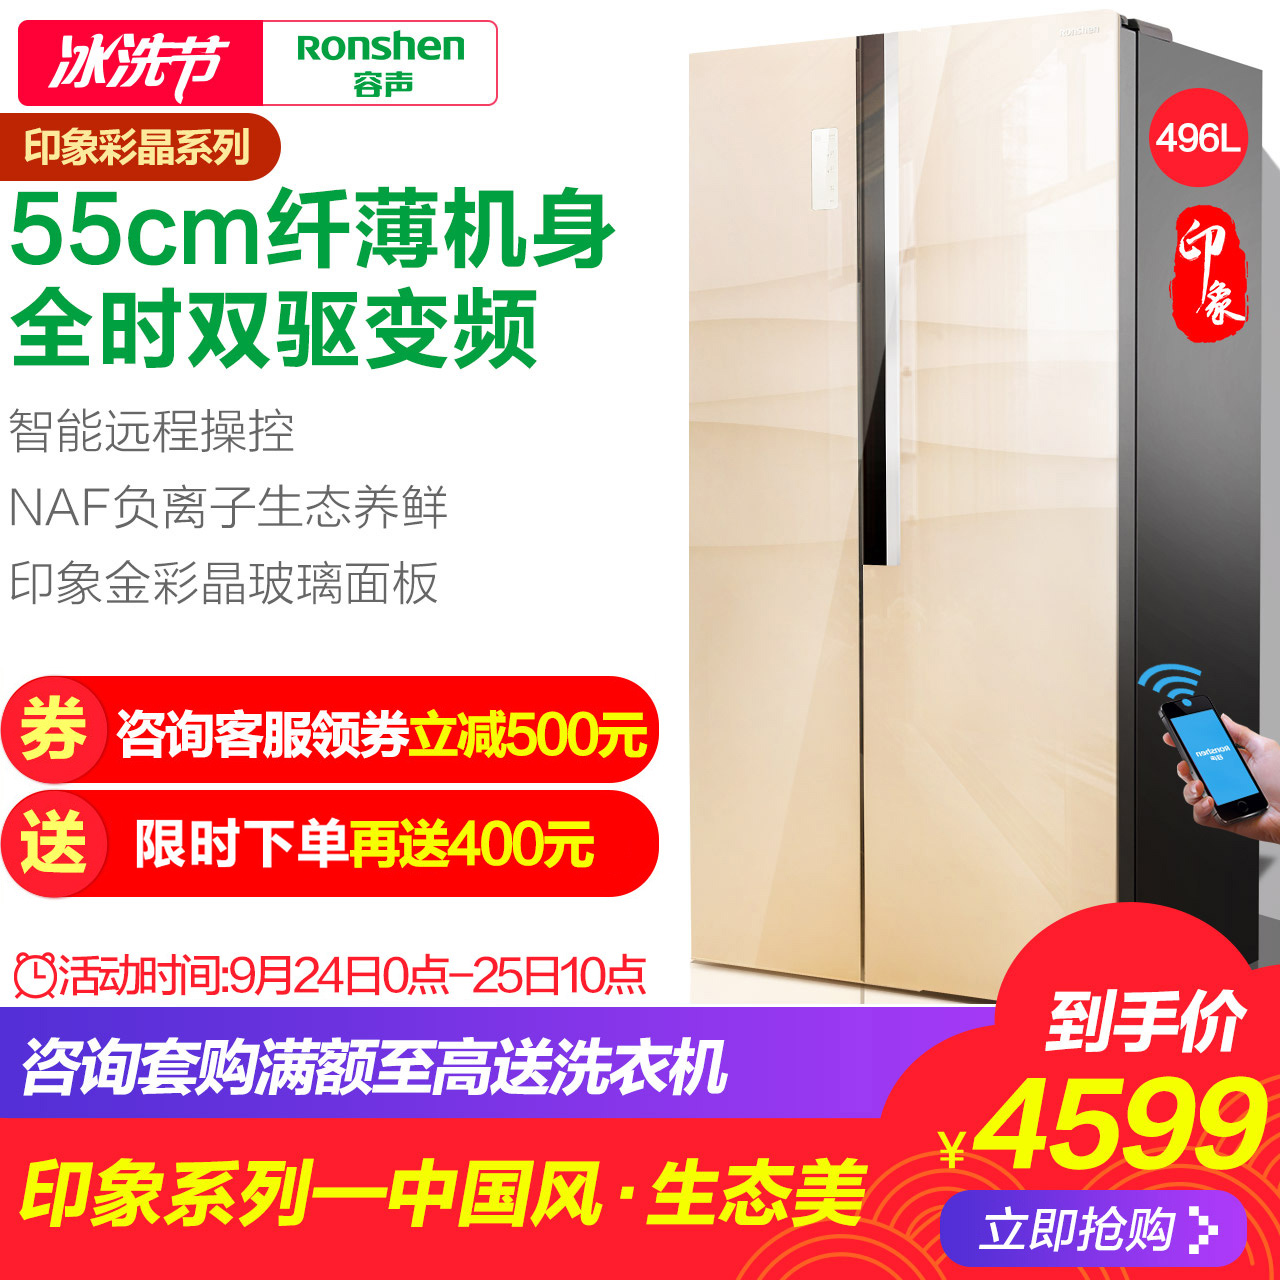 Ronshen-容声 BCD-496WD12HPCA印象彩晶冰箱对开门双开门家用变频